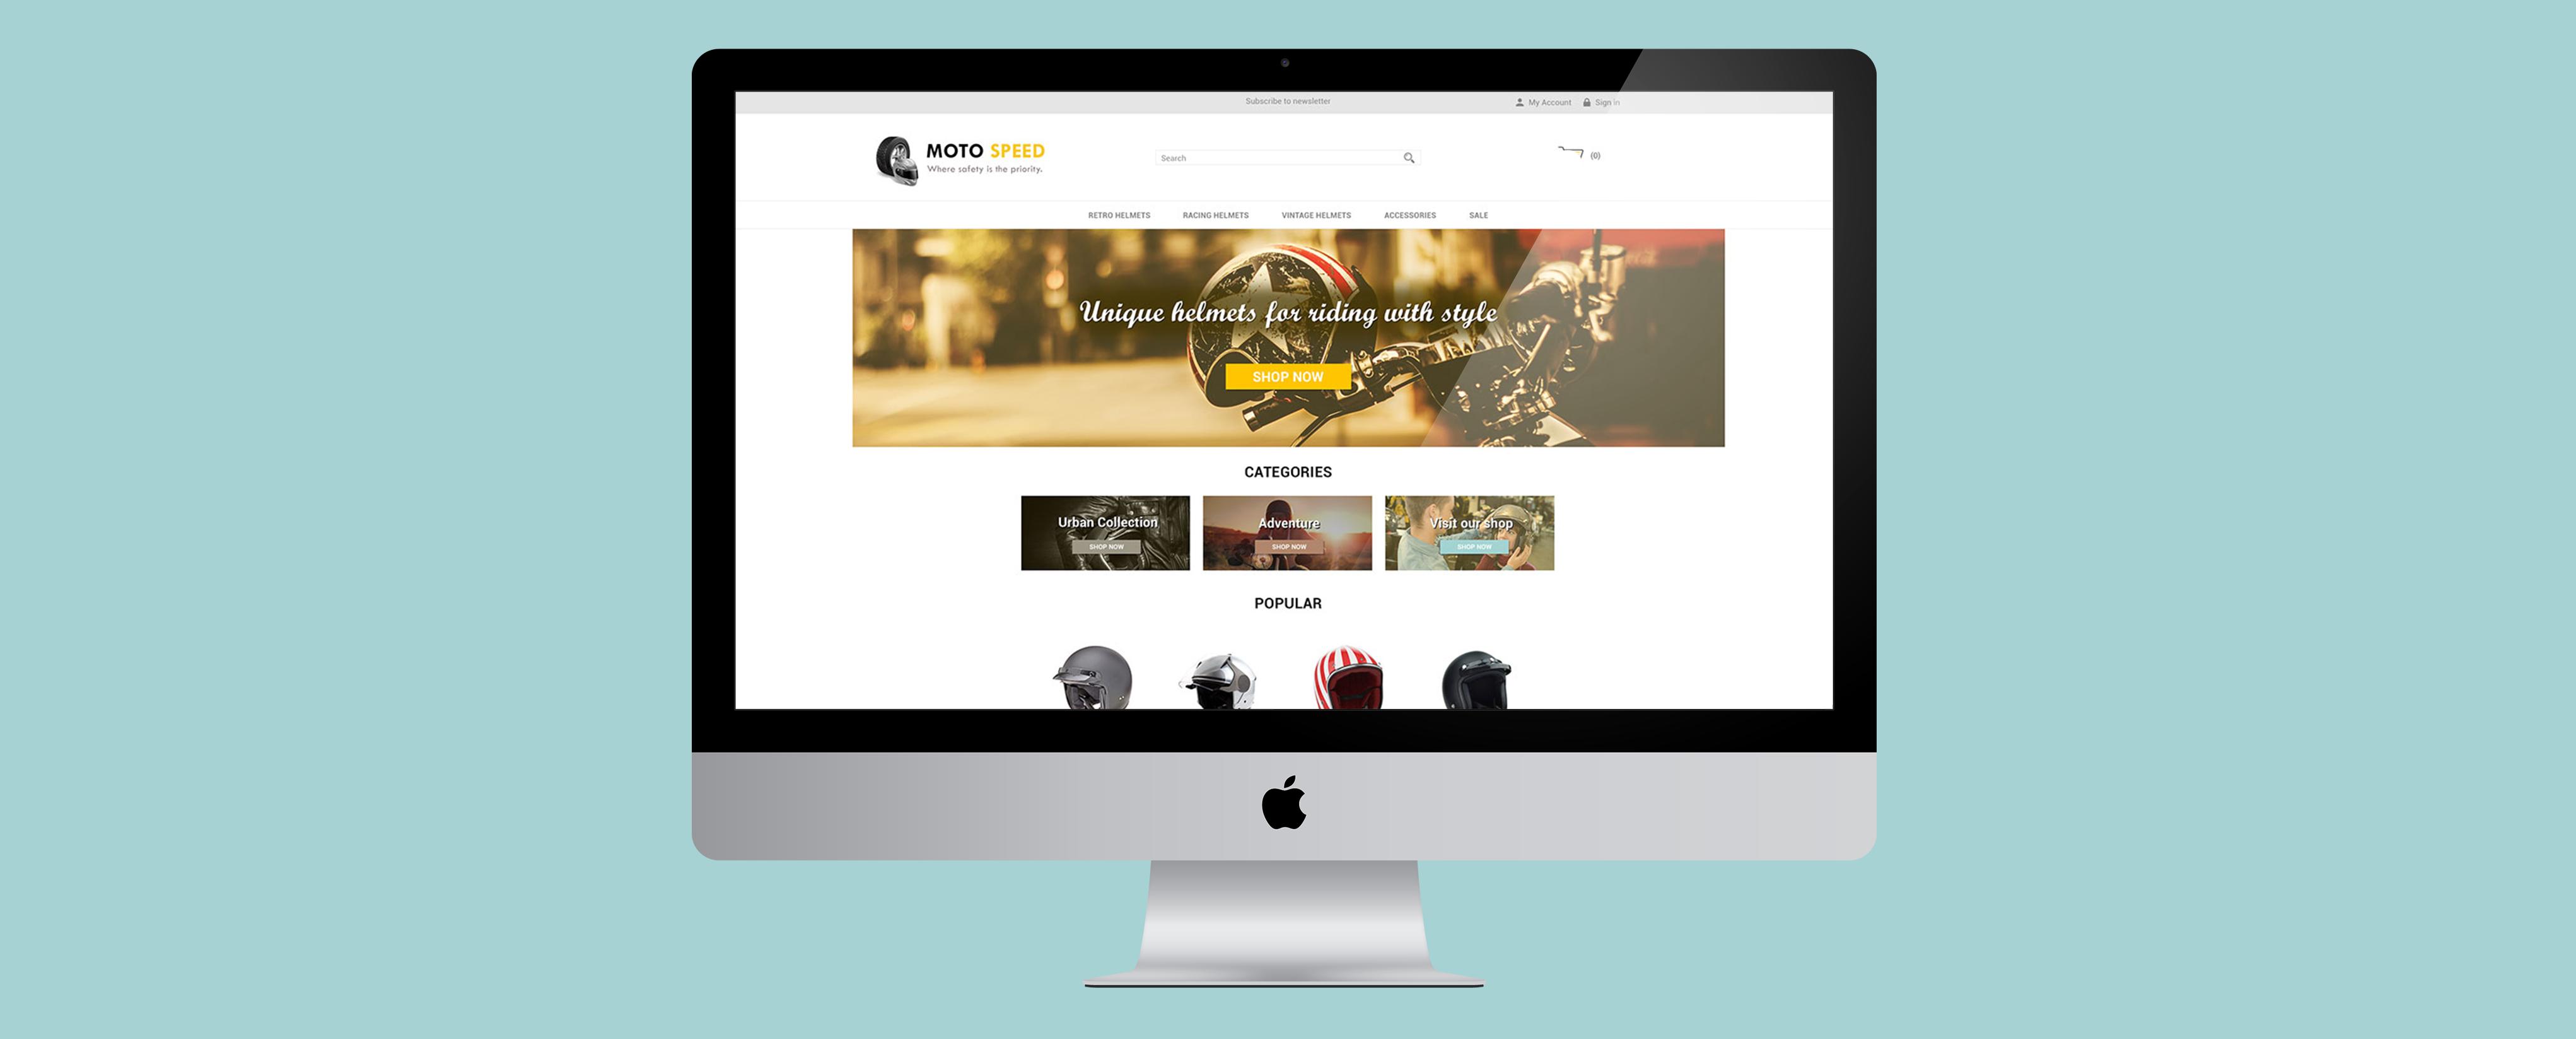 Moto Speed ePages Demo Shop